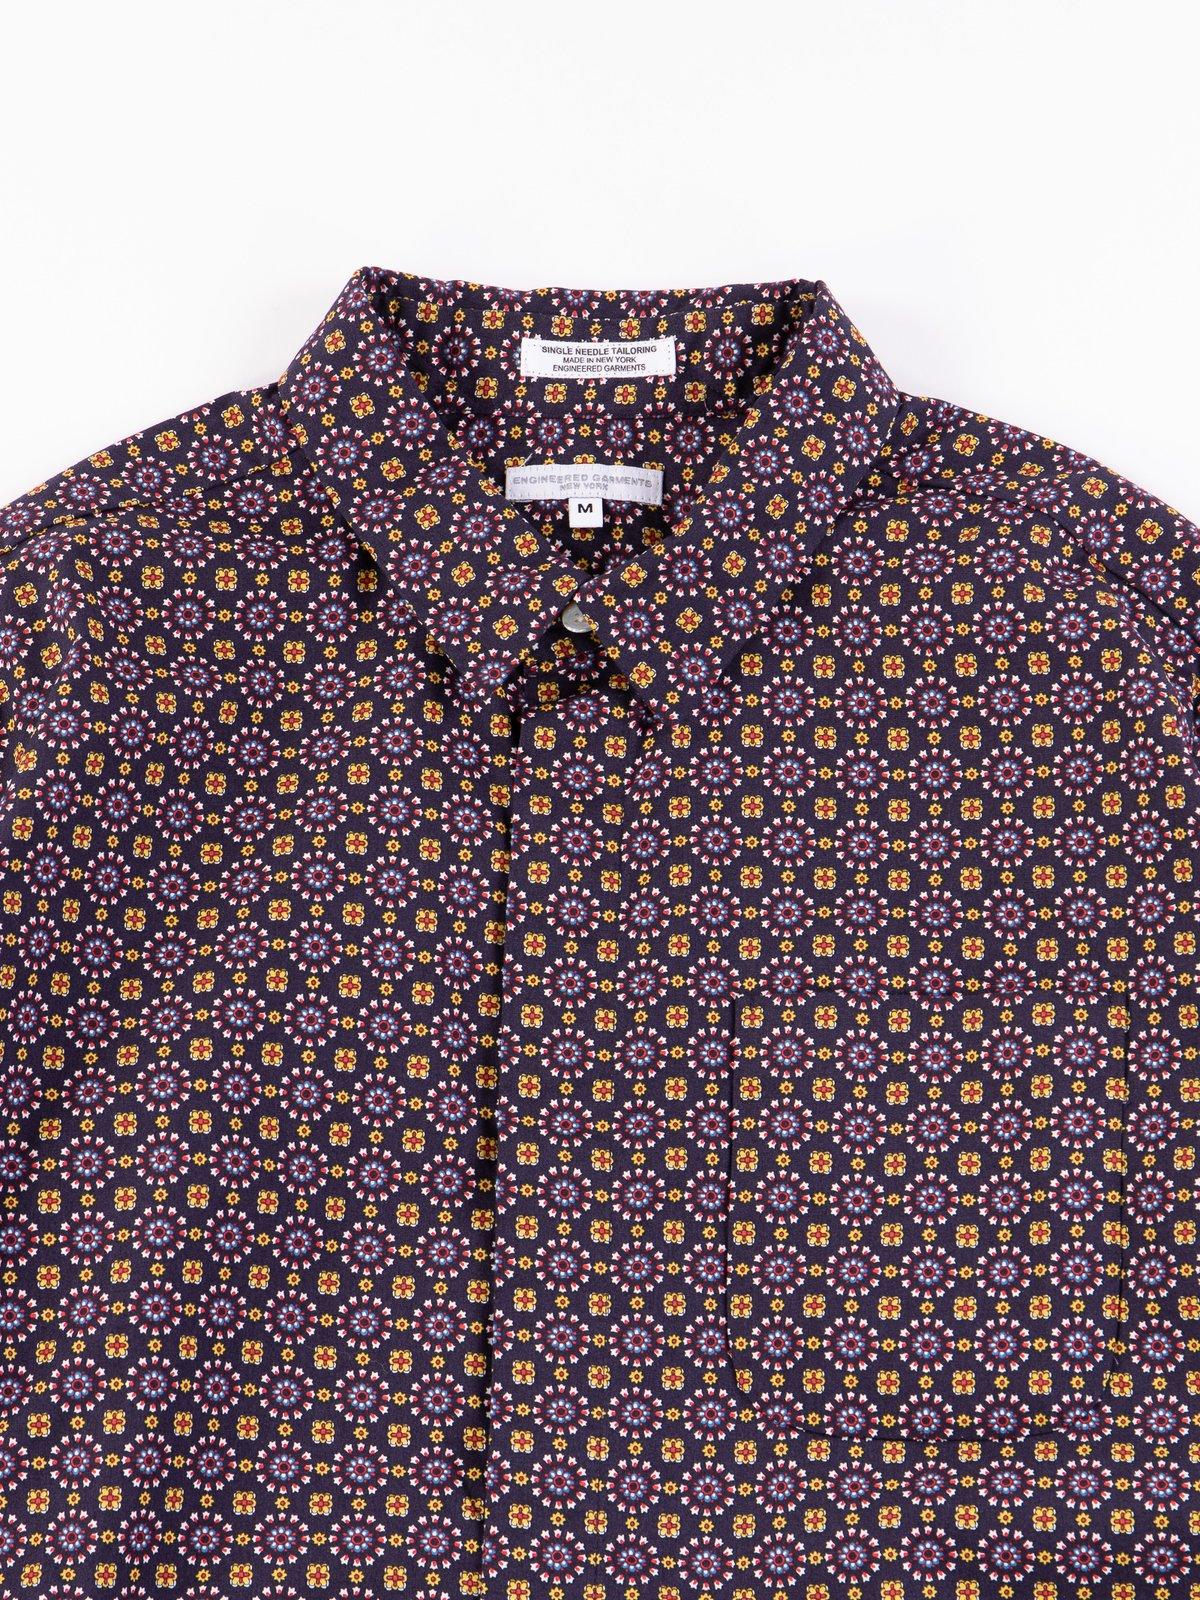 Navy Floral Foulard Print Short Collar Shirt - Image 3